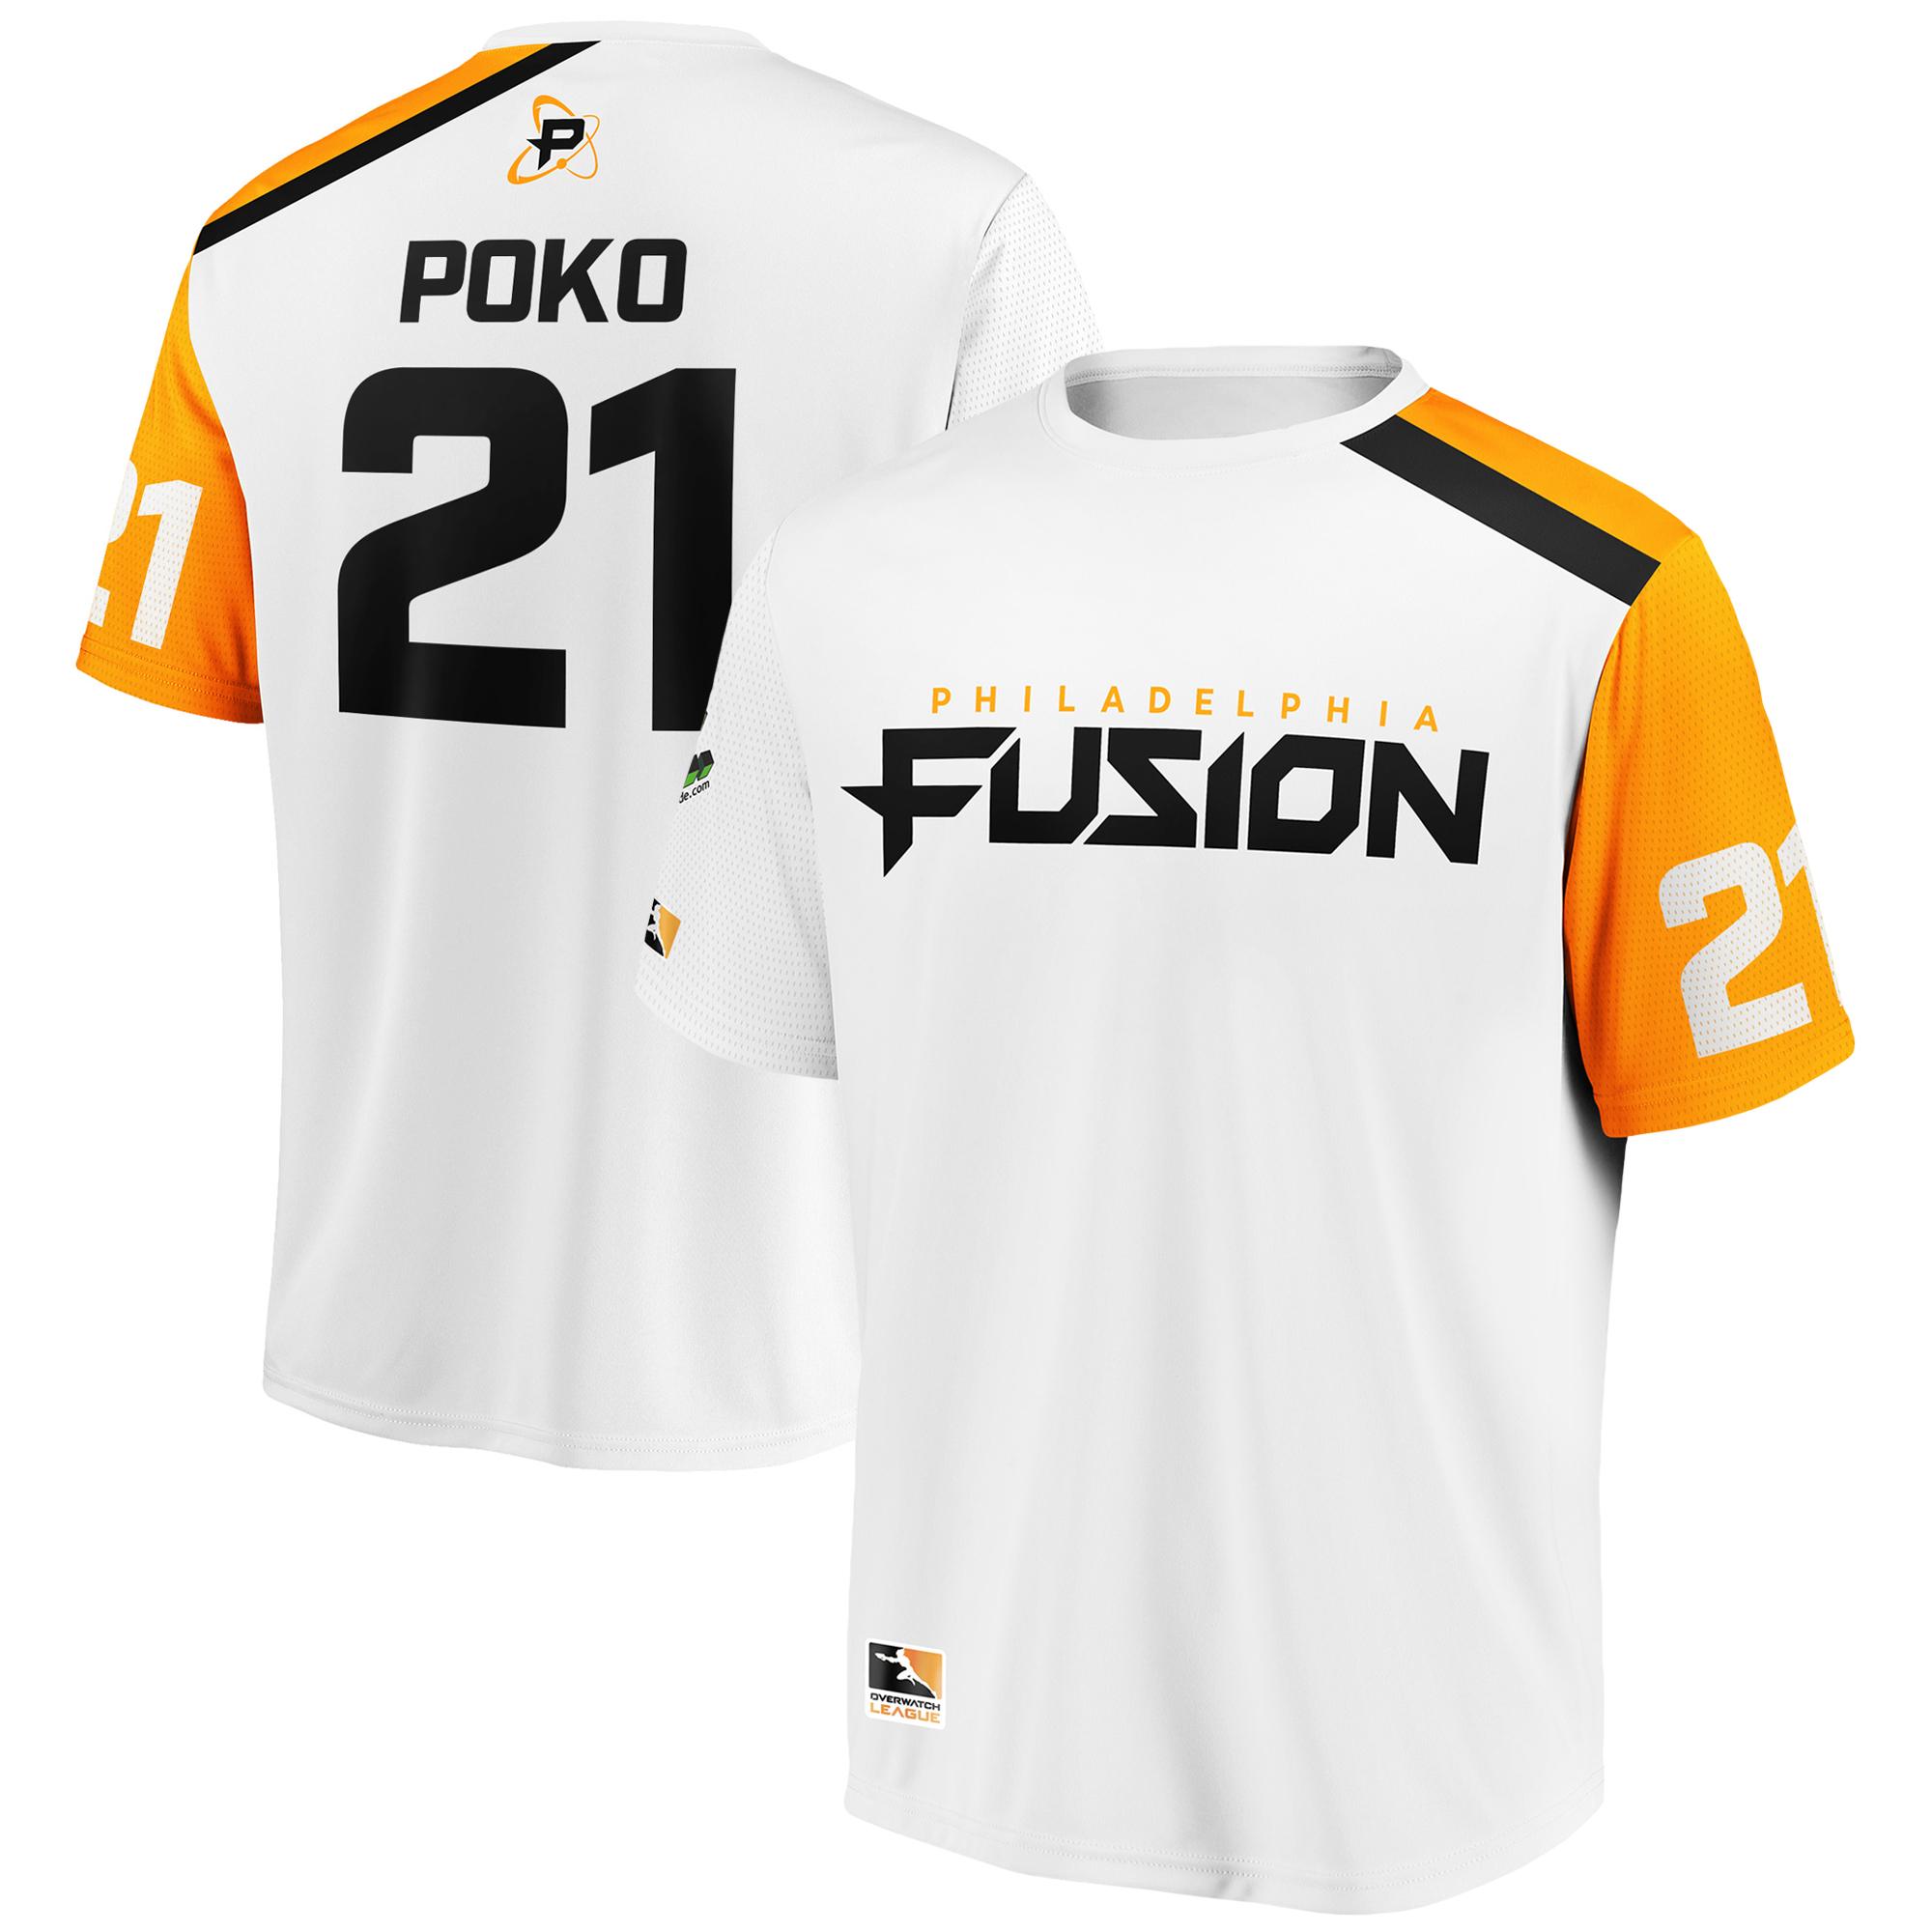 Poko Philadelphia Fusion Overwatch League Replica Away Jersey - White